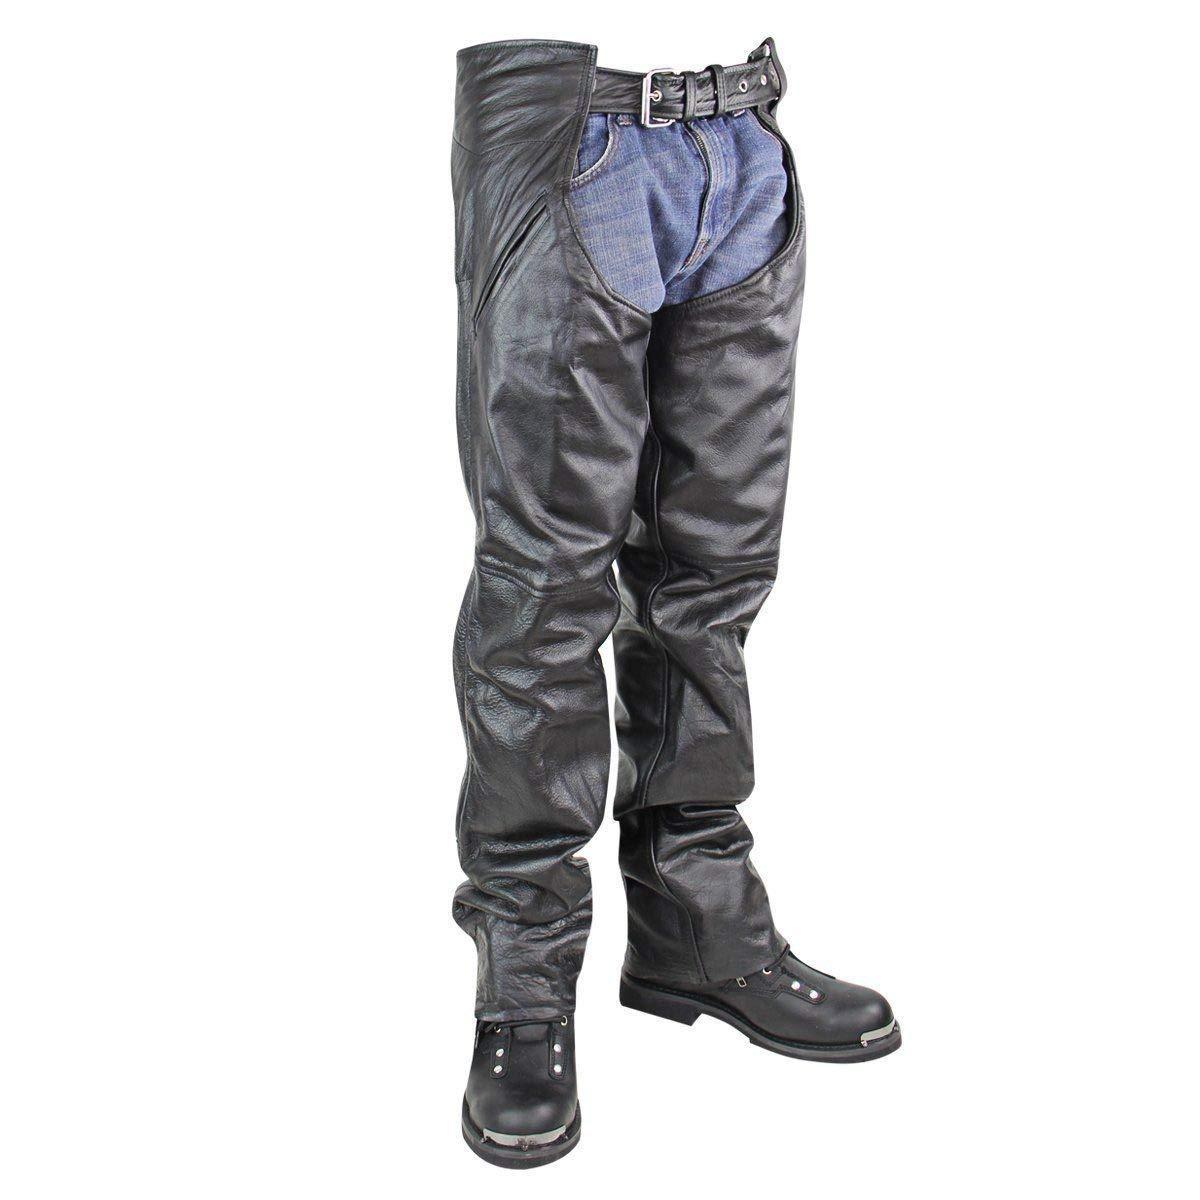 Xelement BXU3026CL 'Drifter' Men's Black Leather Chaps - 34